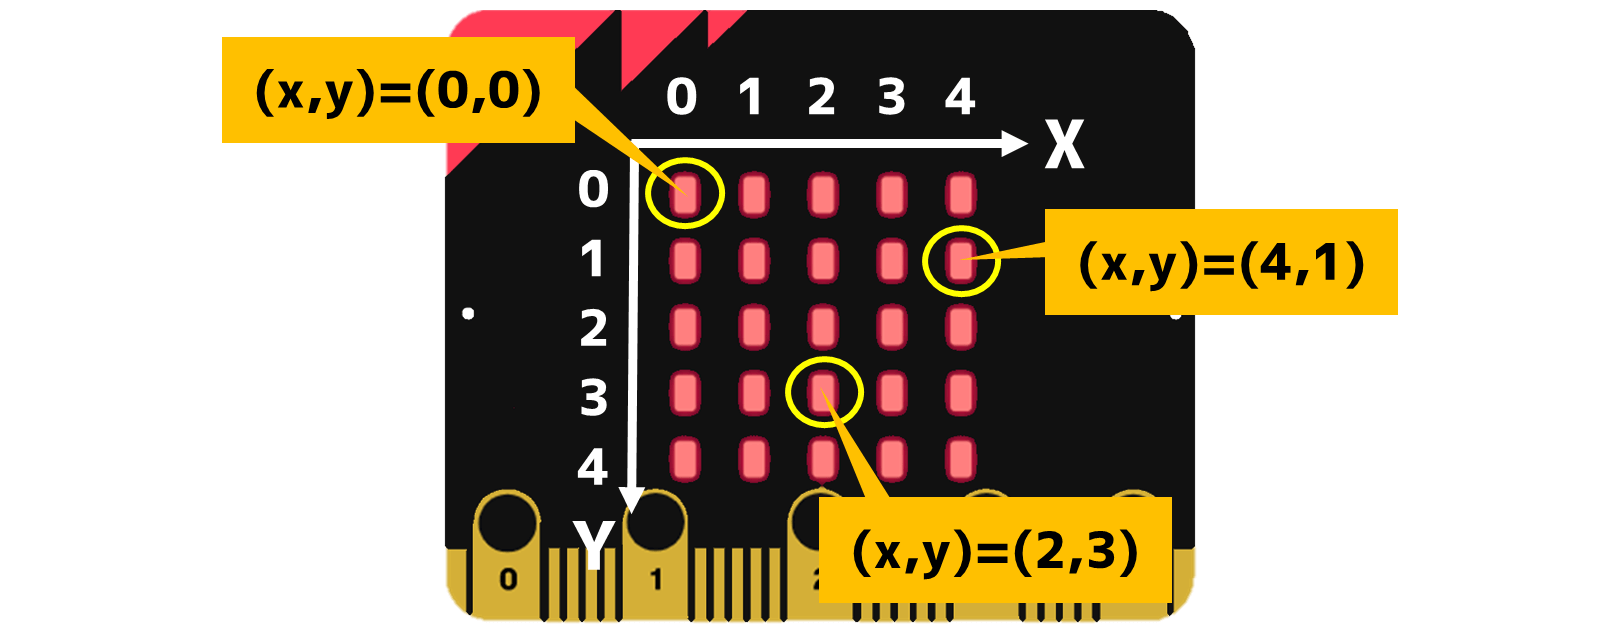 LED座標の例